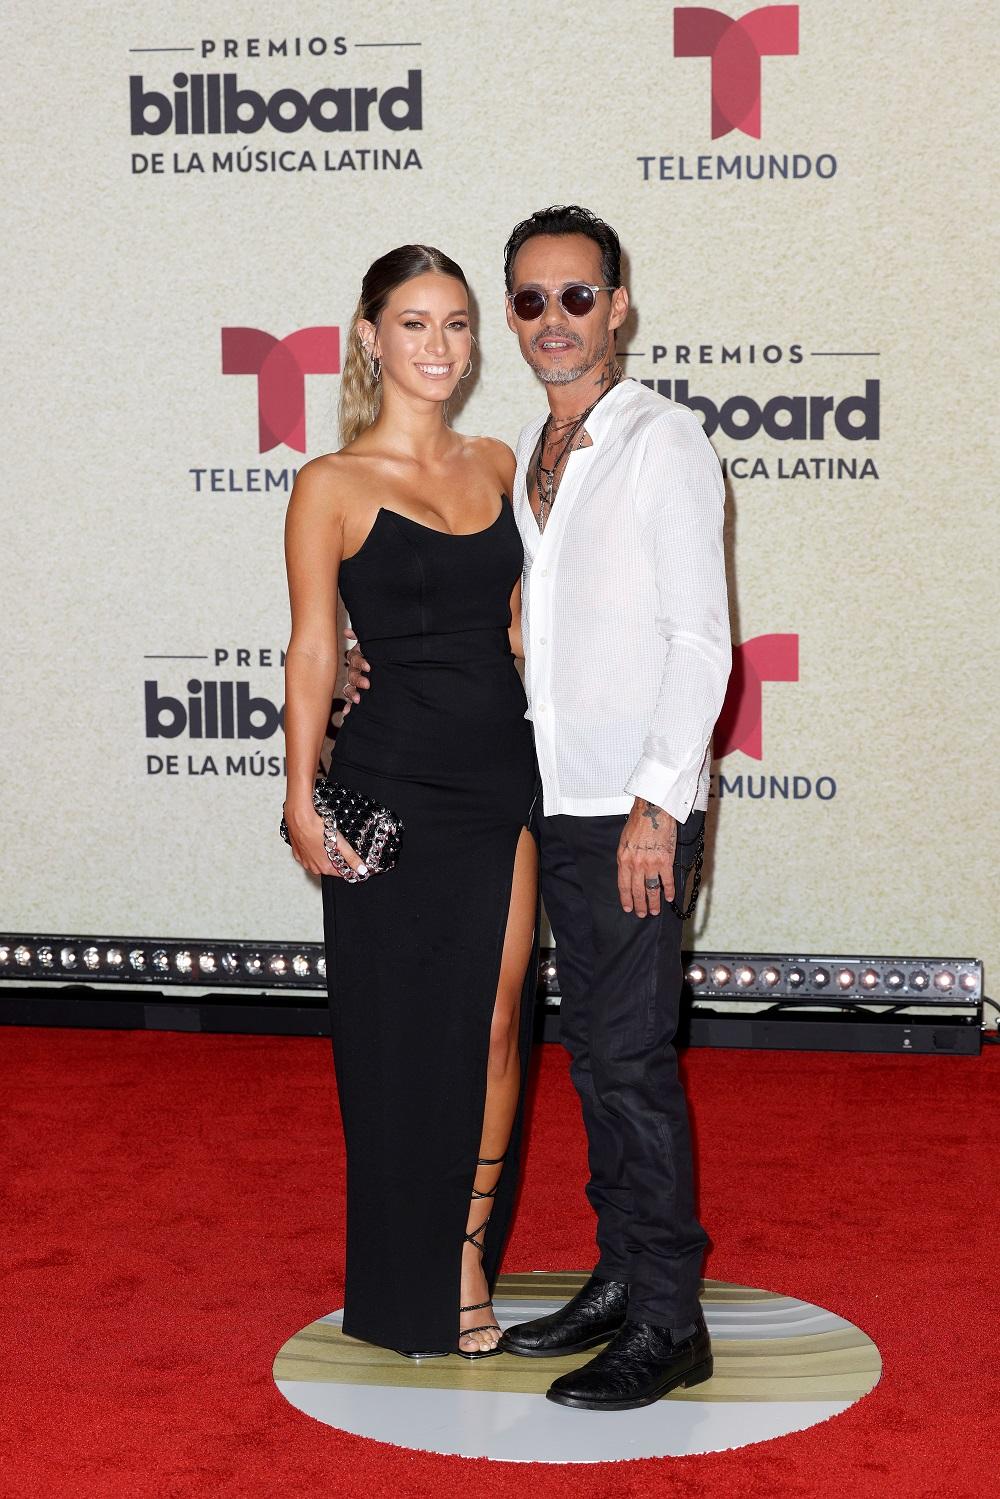 Marc Anthony y su pareja. (Suministrada/ Telemundo)